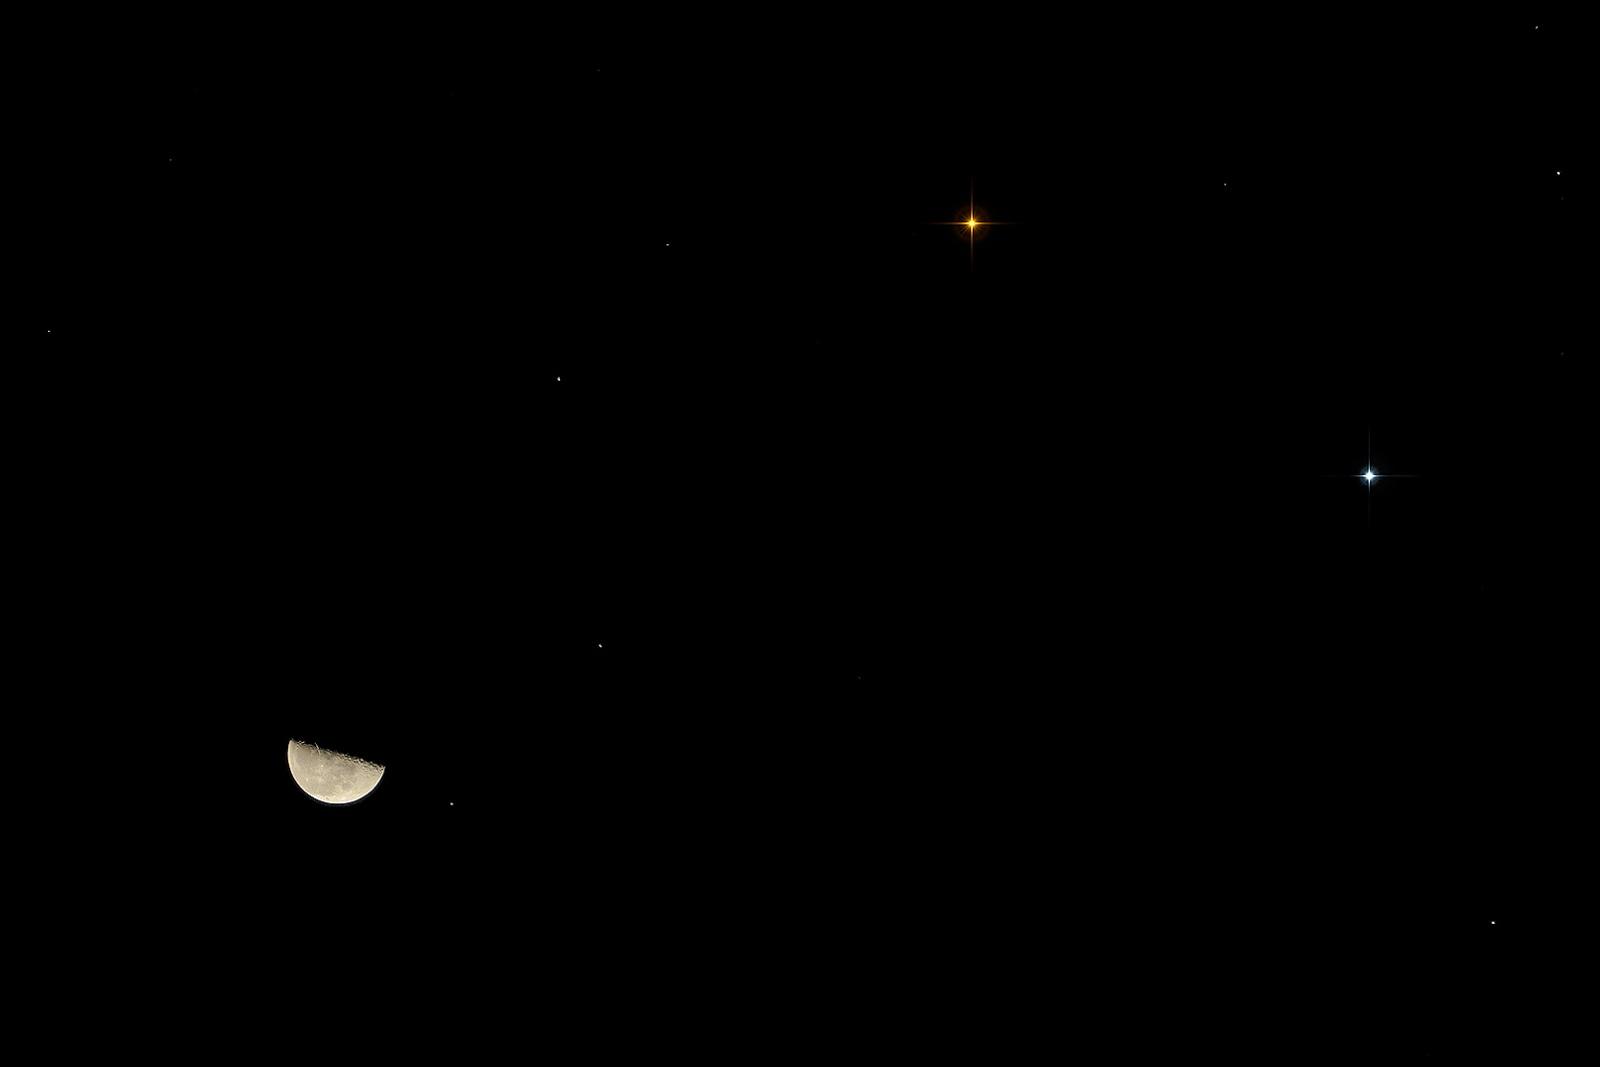 esplaobs: LAST QUARTER MOON, MARS AND SATURN Taken by Peter